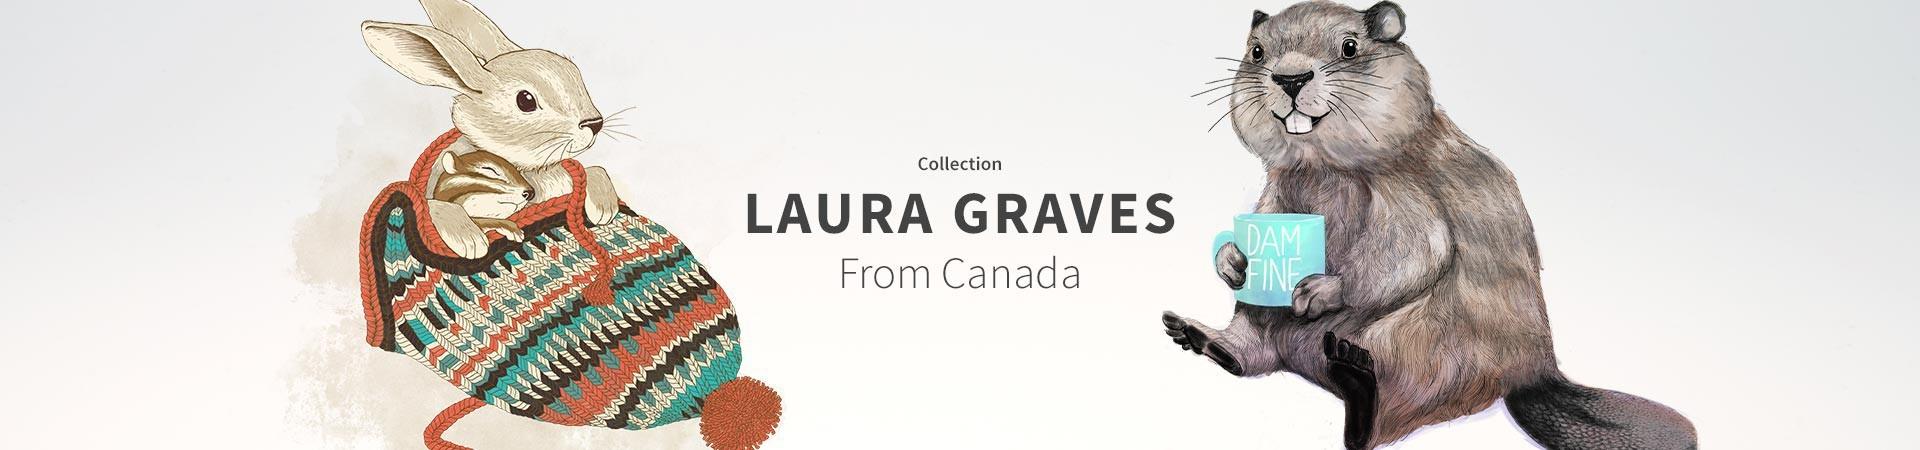 Laura Graves